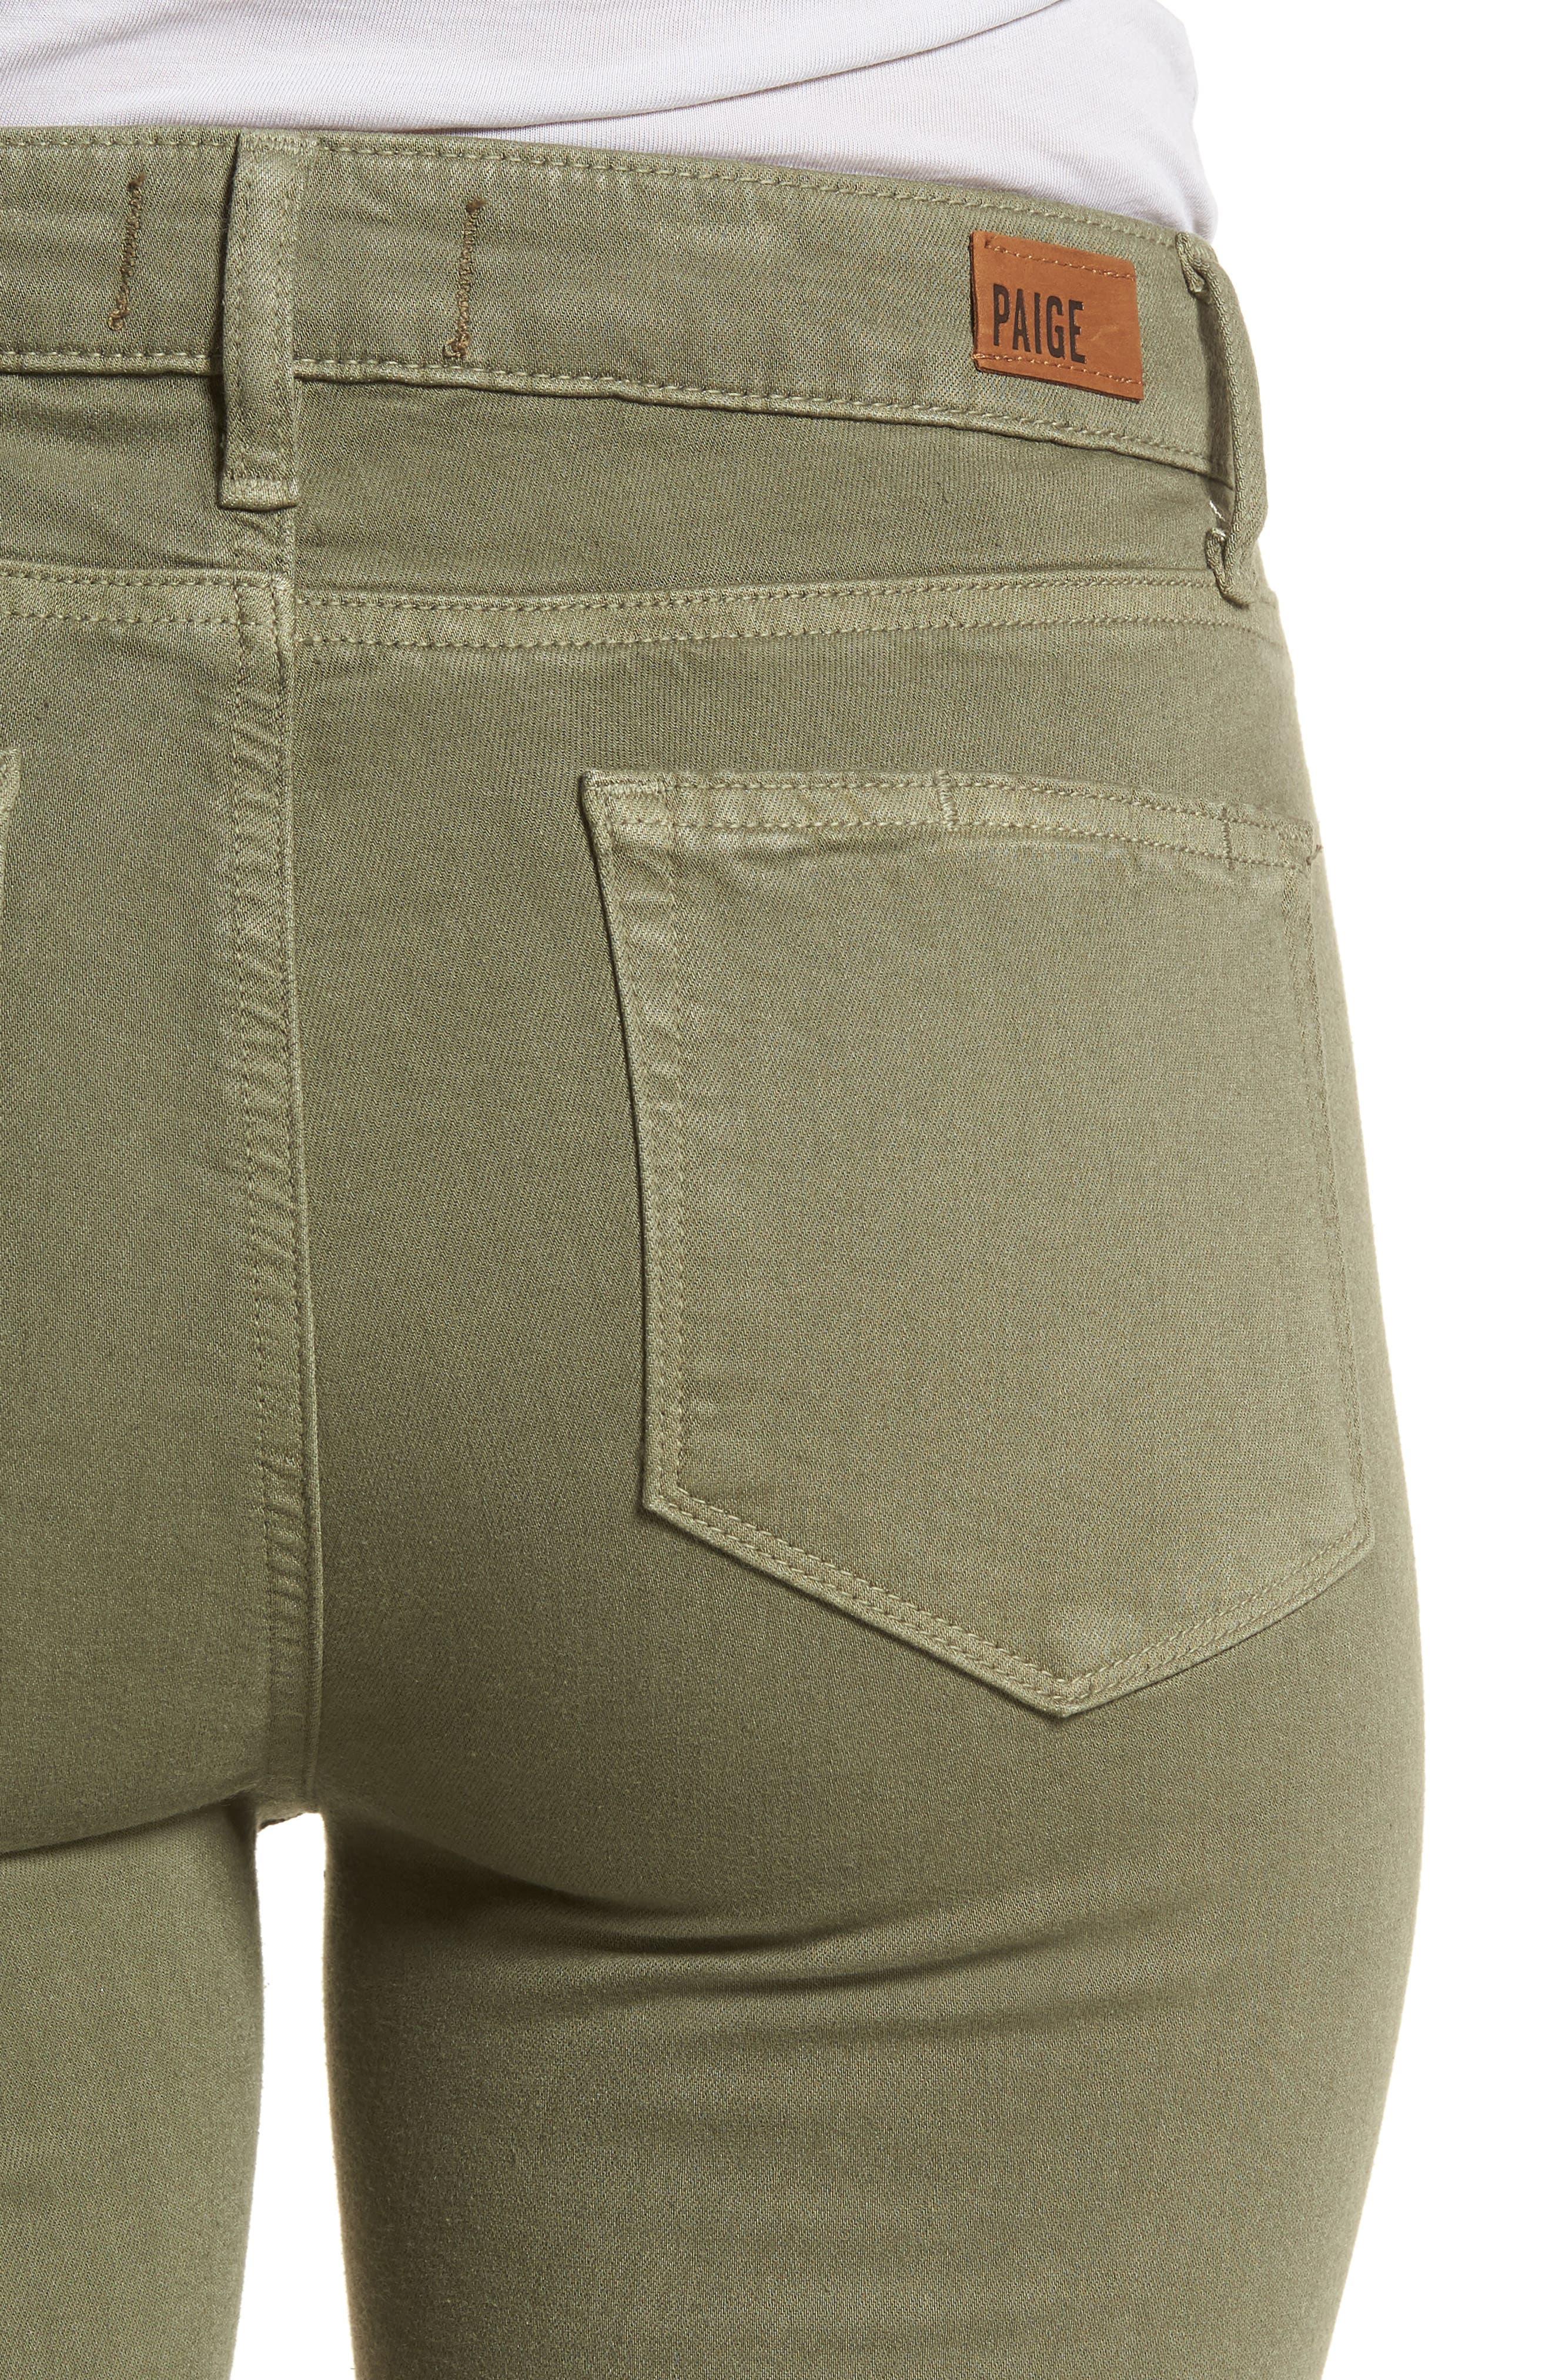 Hoxton Transcend High Waist Crop Skinny Jeans,                             Alternate thumbnail 4, color,